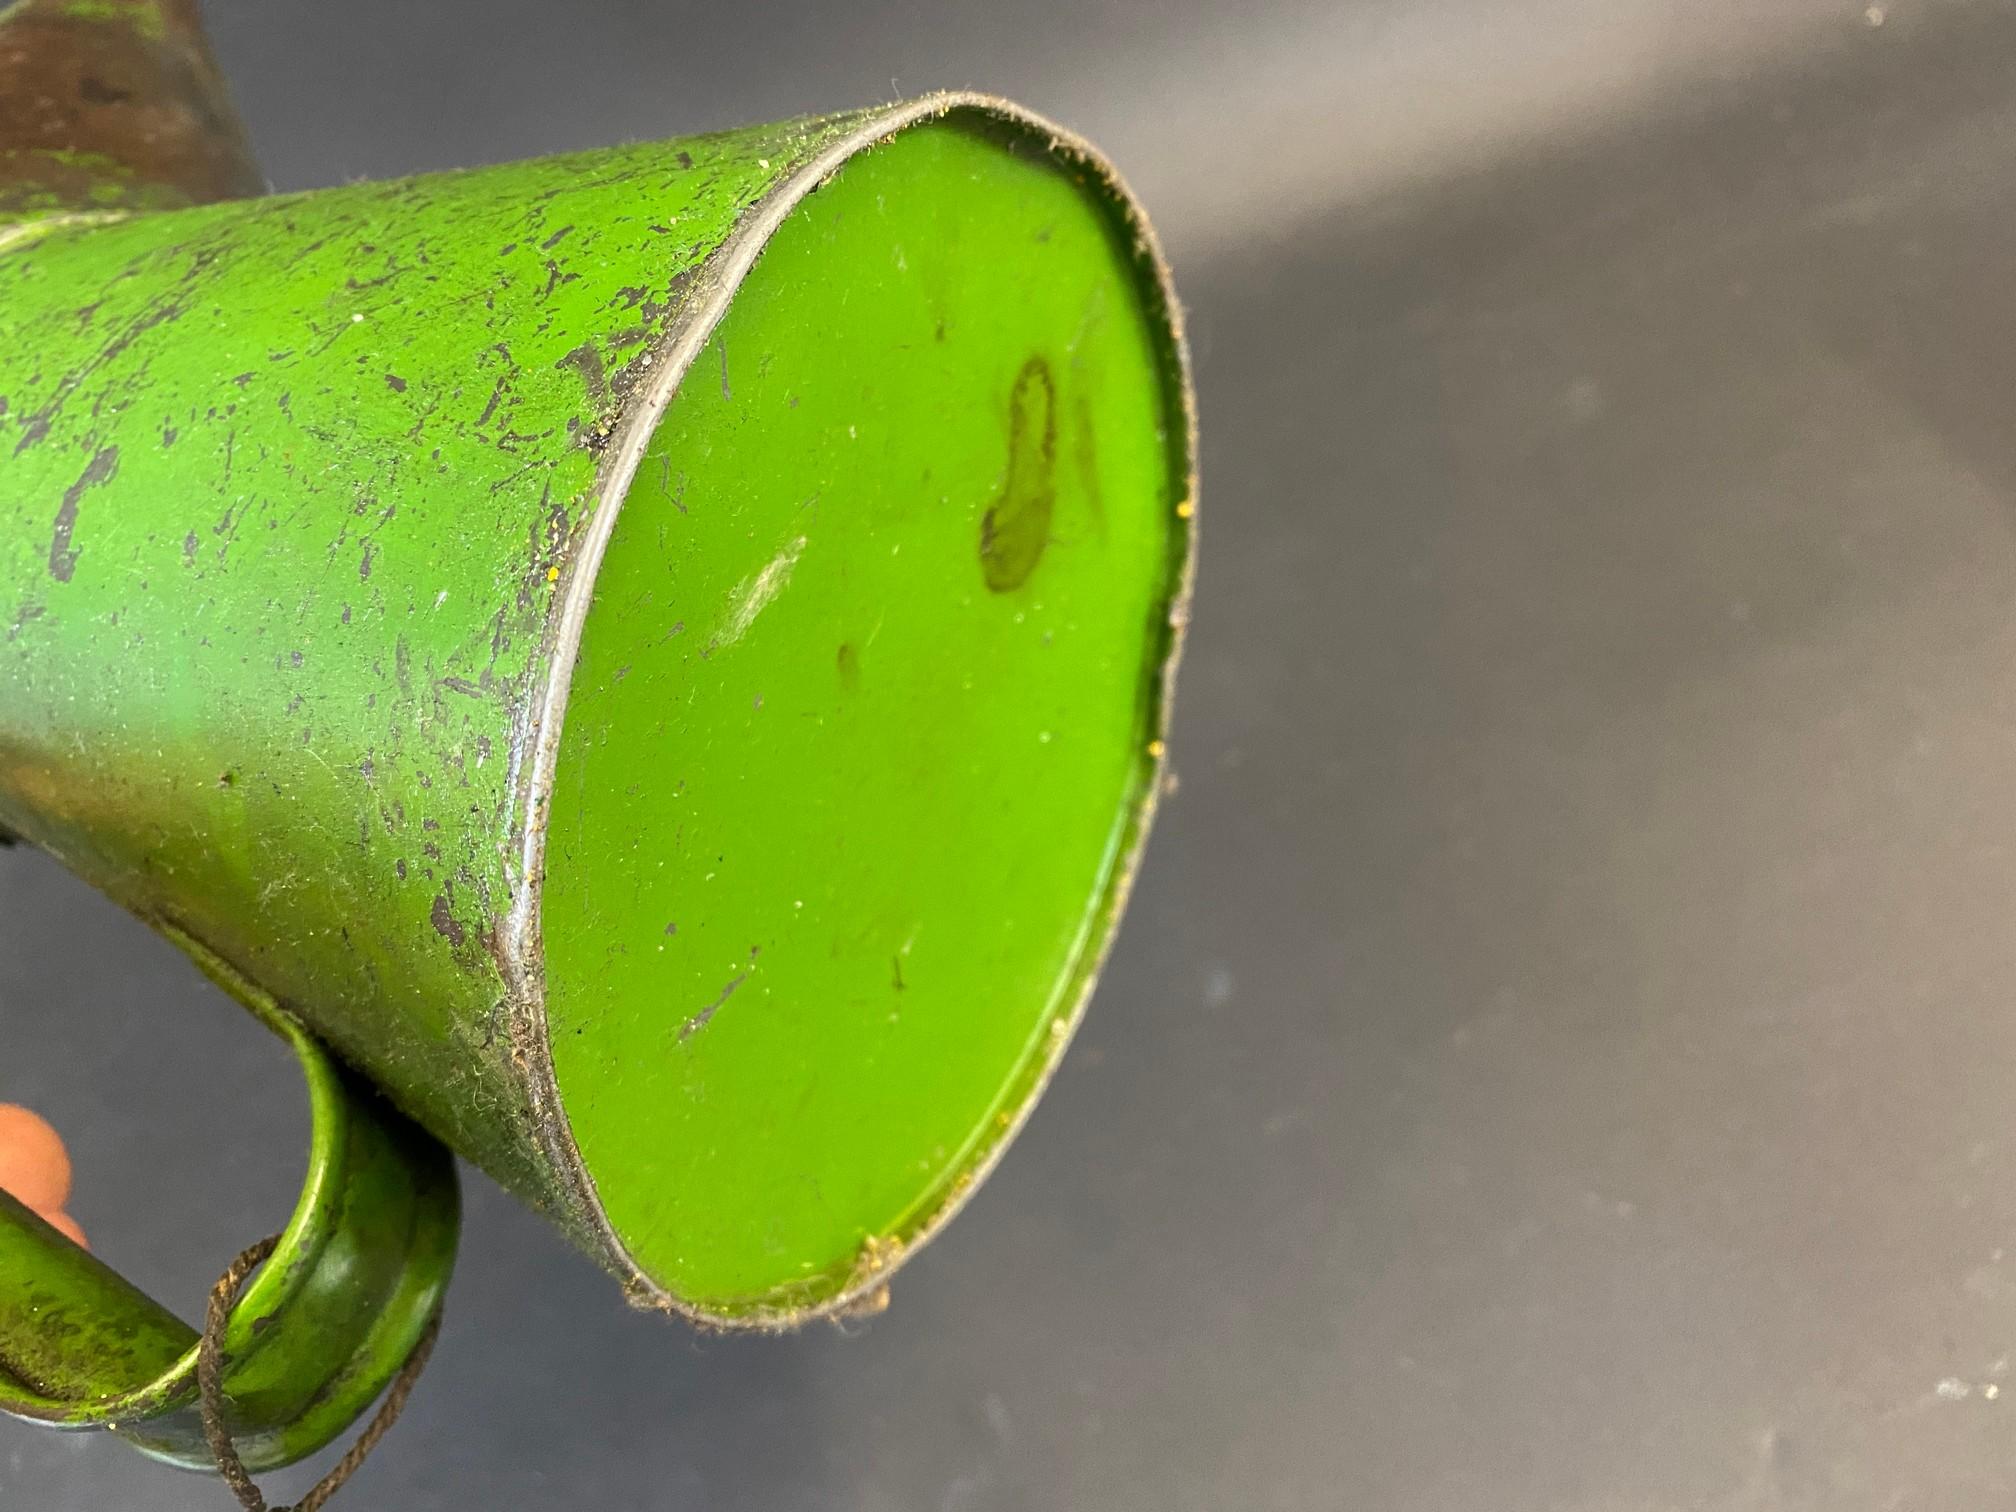 A Royal Snowdrift Oil quart measure. - Image 5 of 5